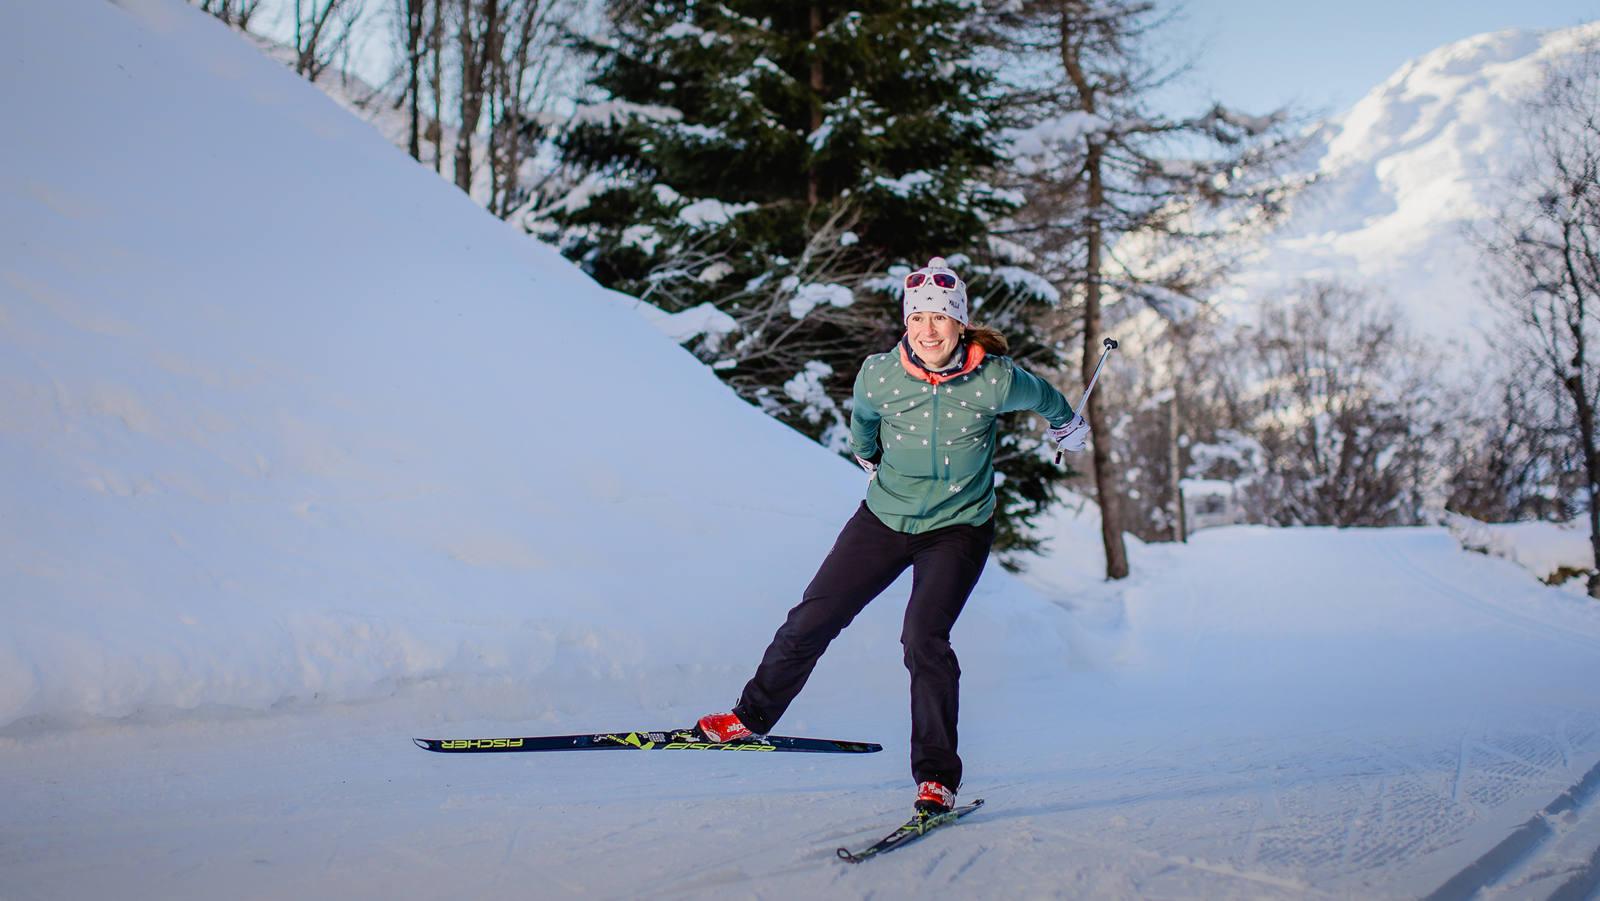 Ski de fond: 8 exercices pour améliorer sa technique skating